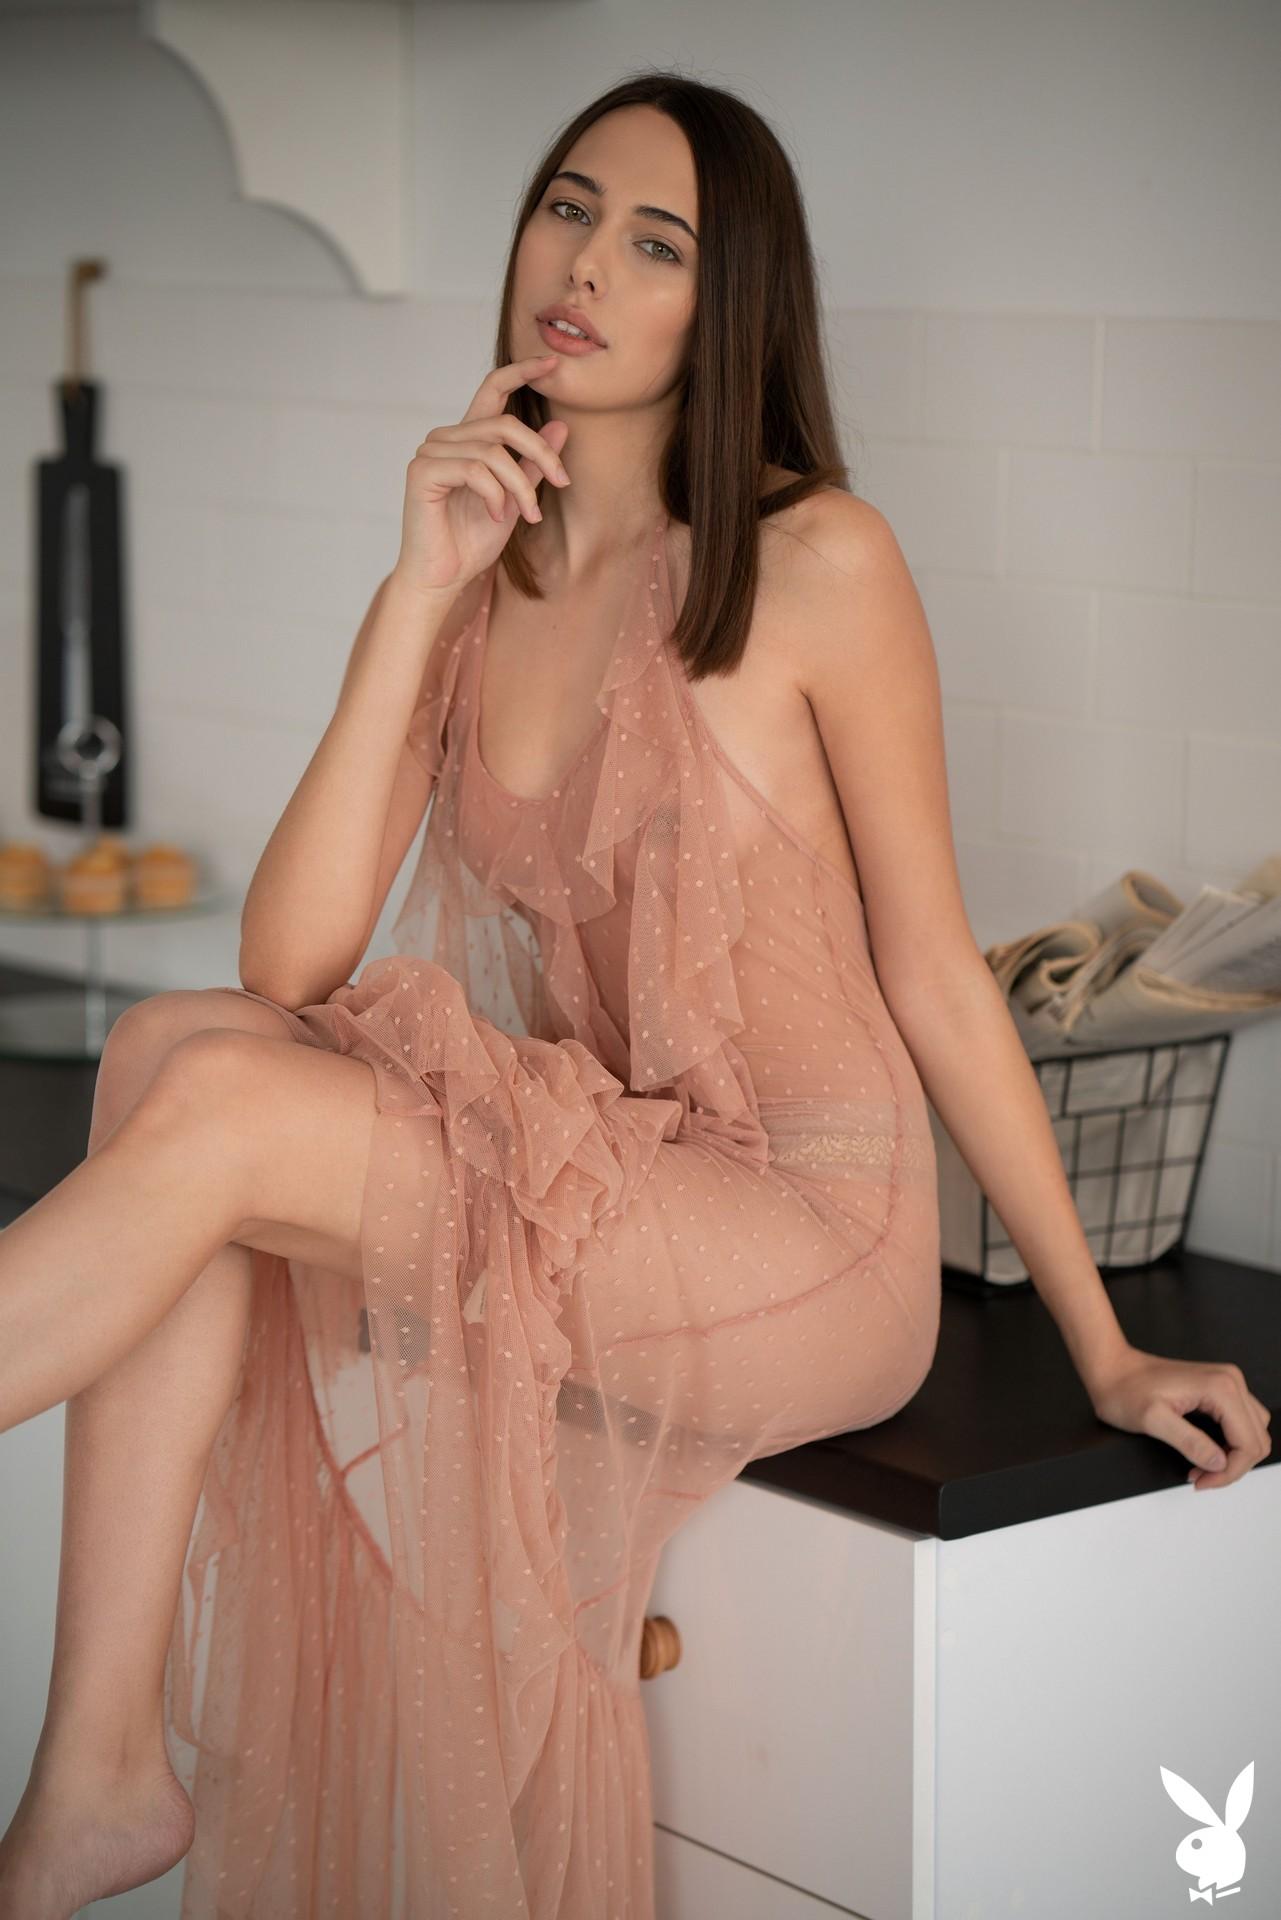 Katrine Pirs In Essence Of Life Playboy Plus (3)